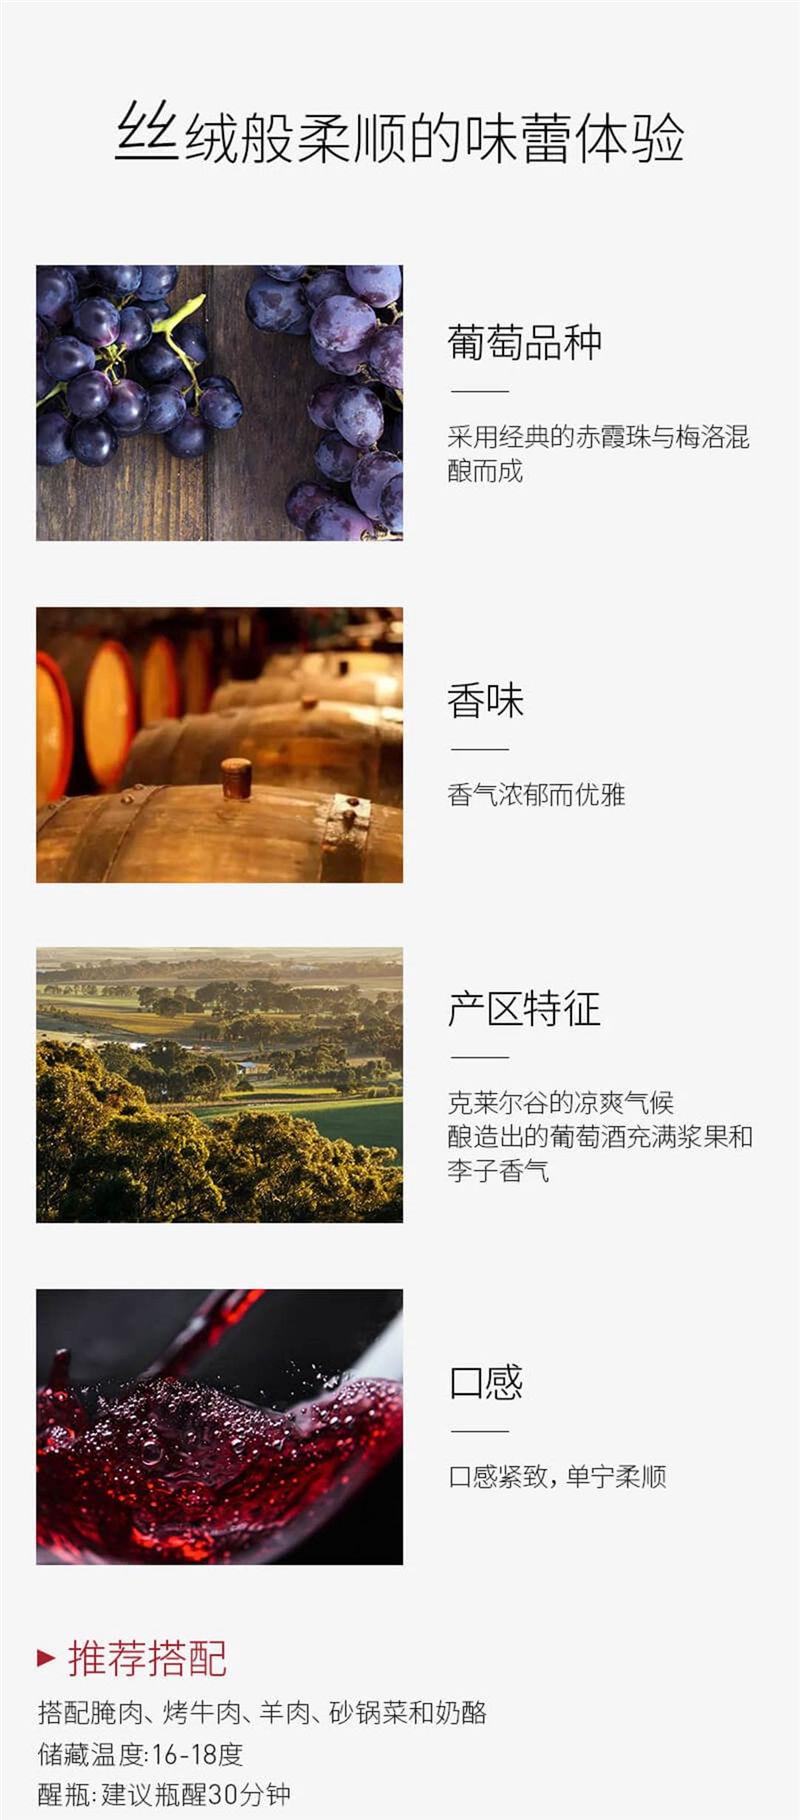 Paulett Wines克莱尔谷赤霞珠梅洛干红葡萄酒750ml